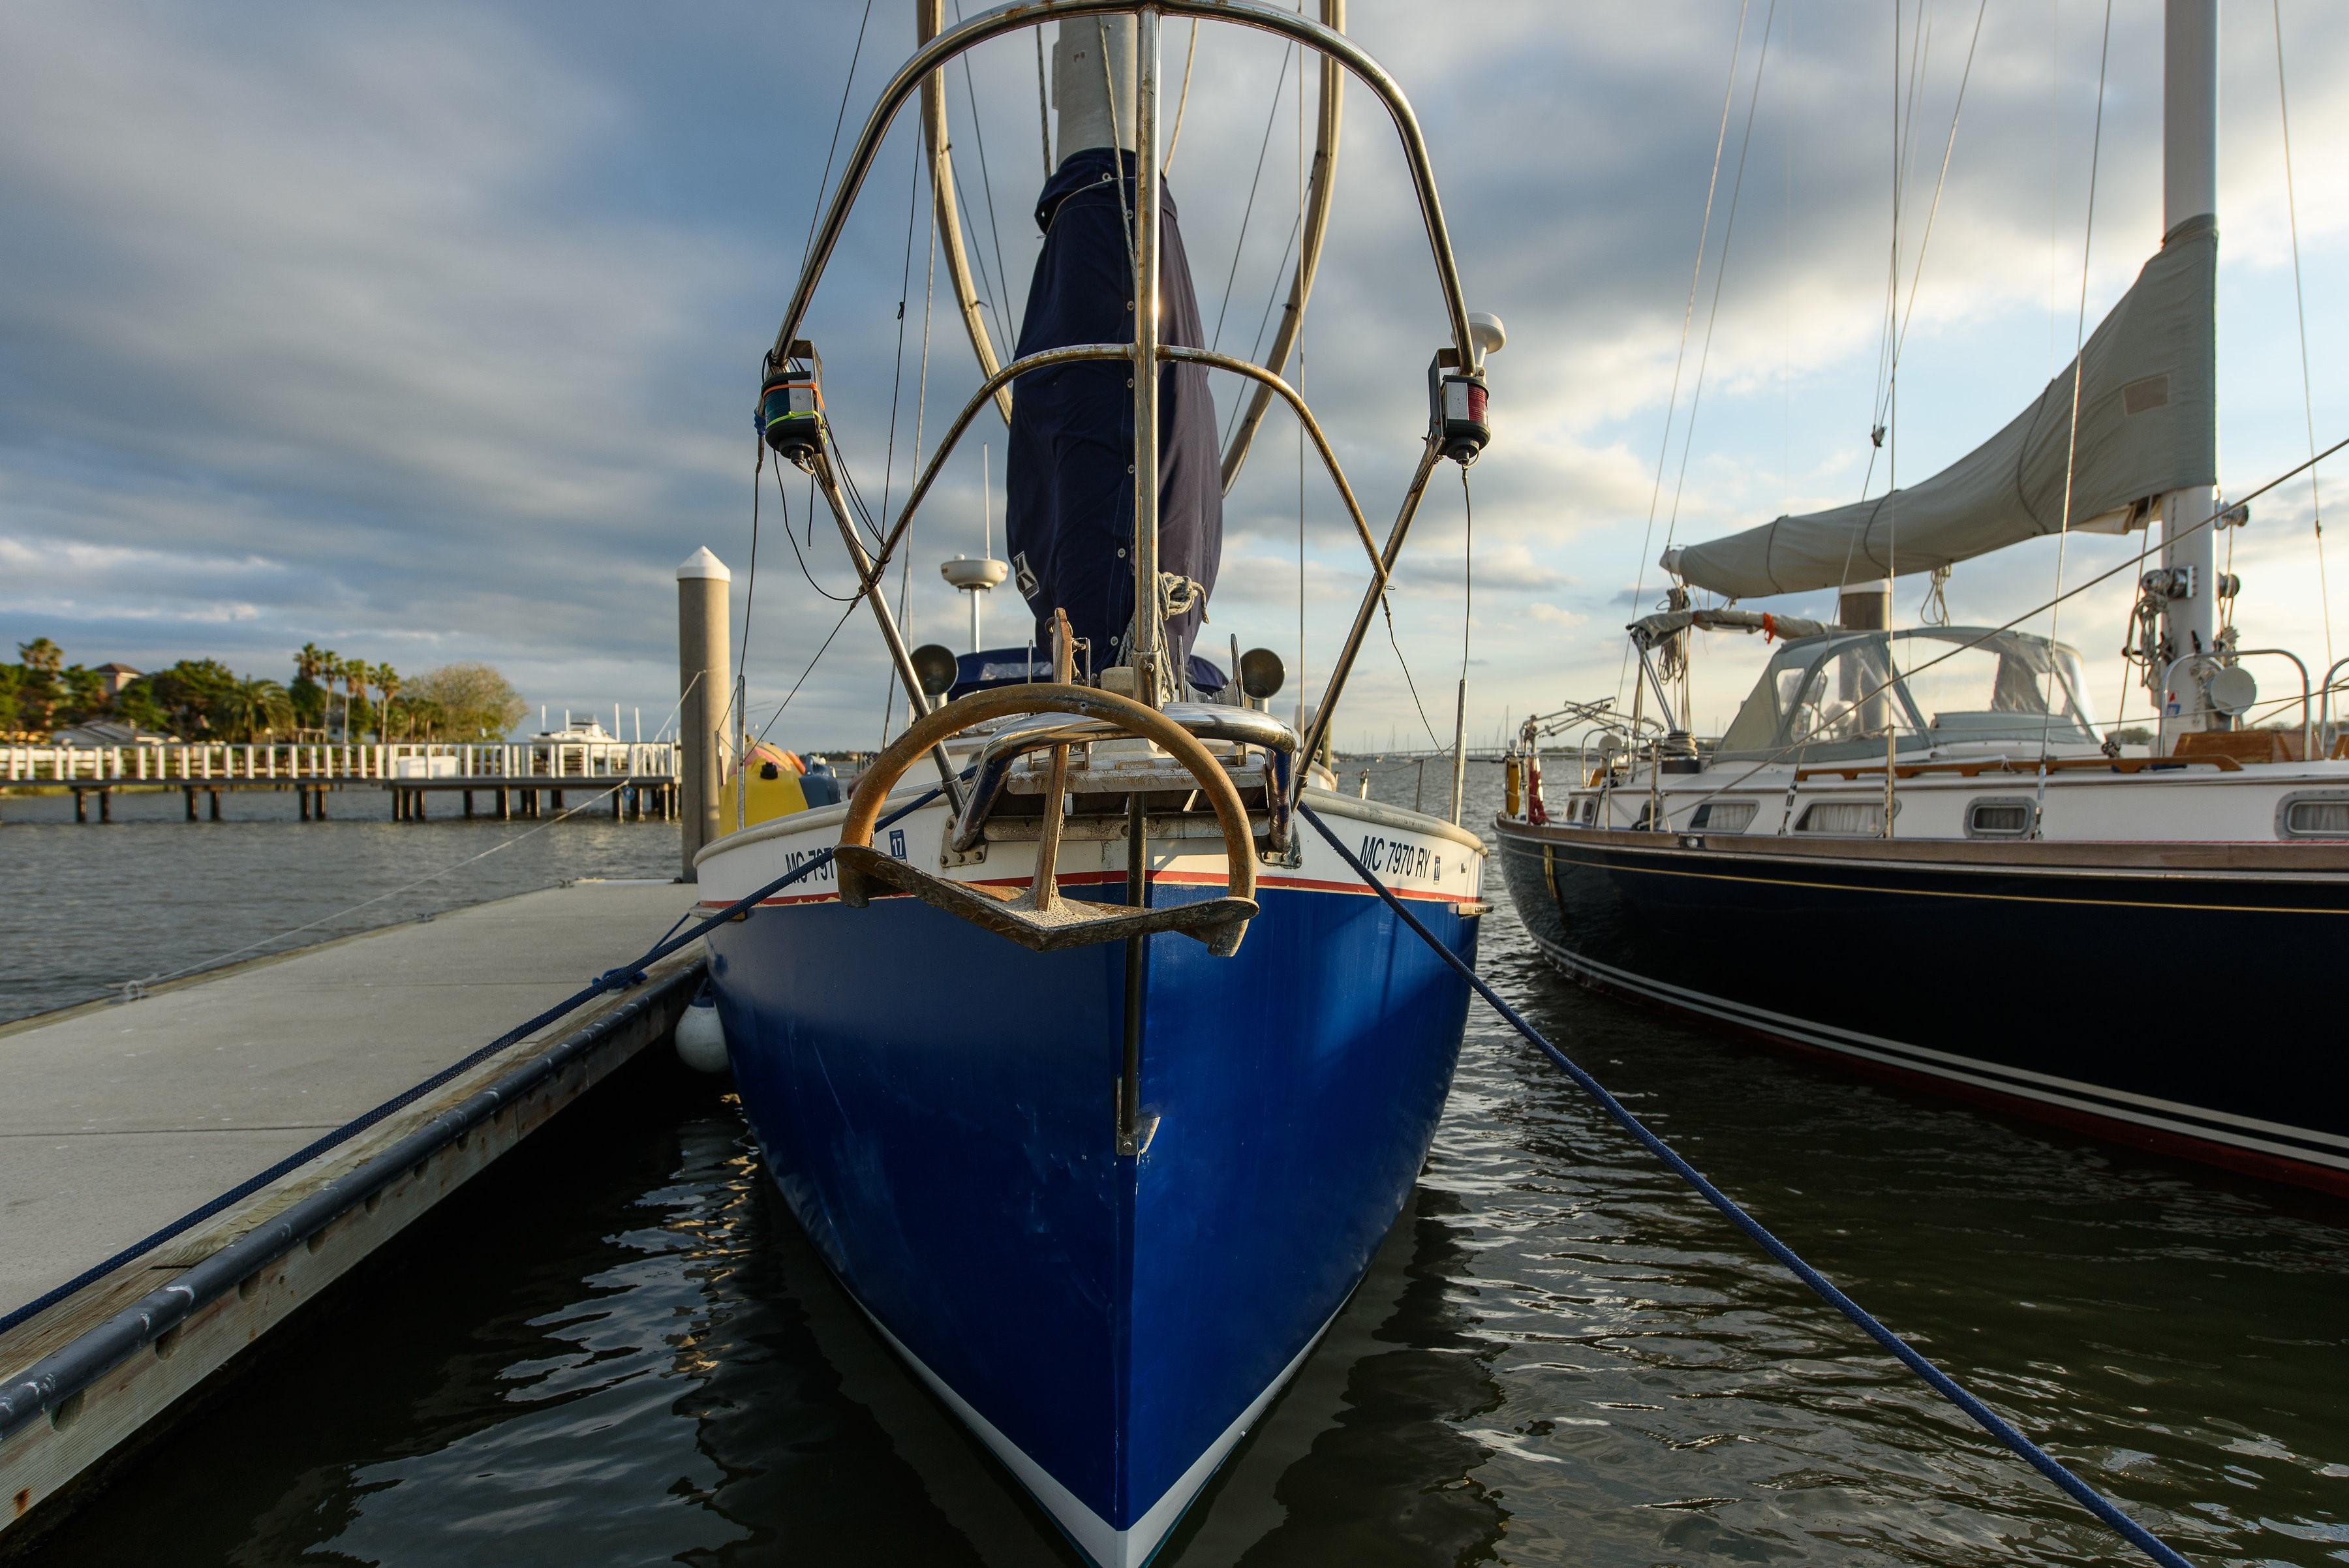 sail boat in marina